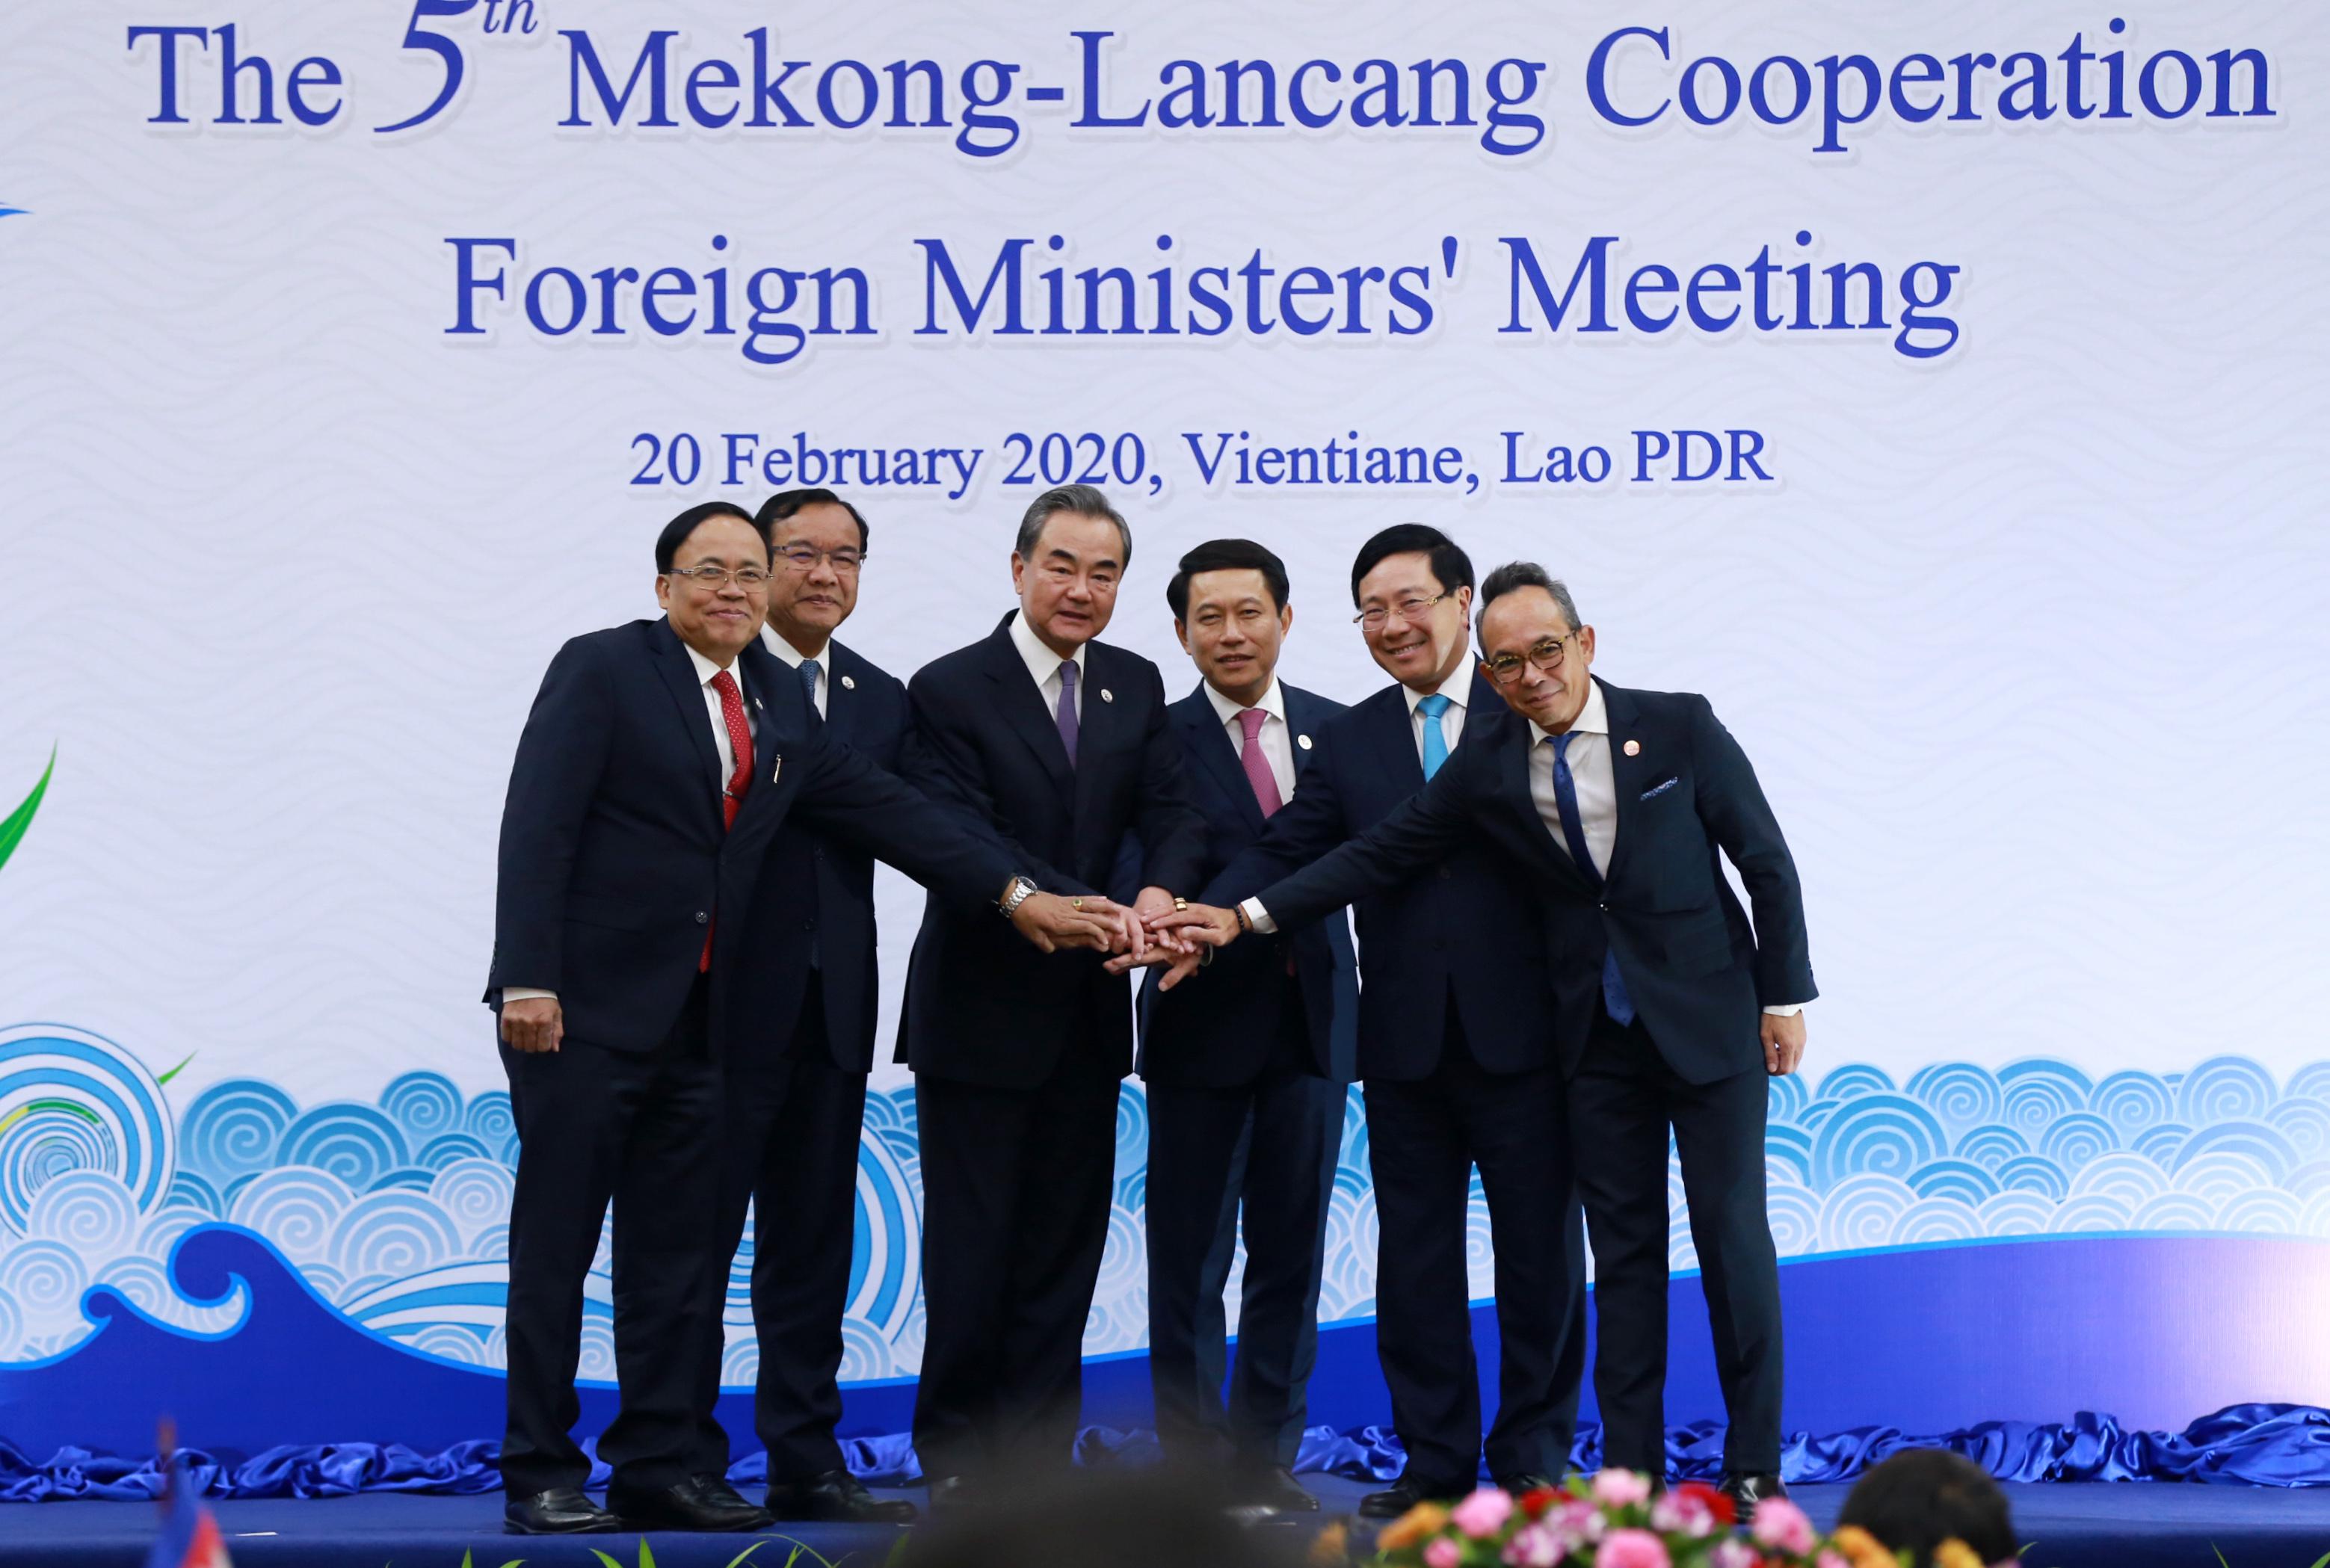 Países del Lancang-Mekong trabajarán juntos para superar dificultades, según Wang Yi